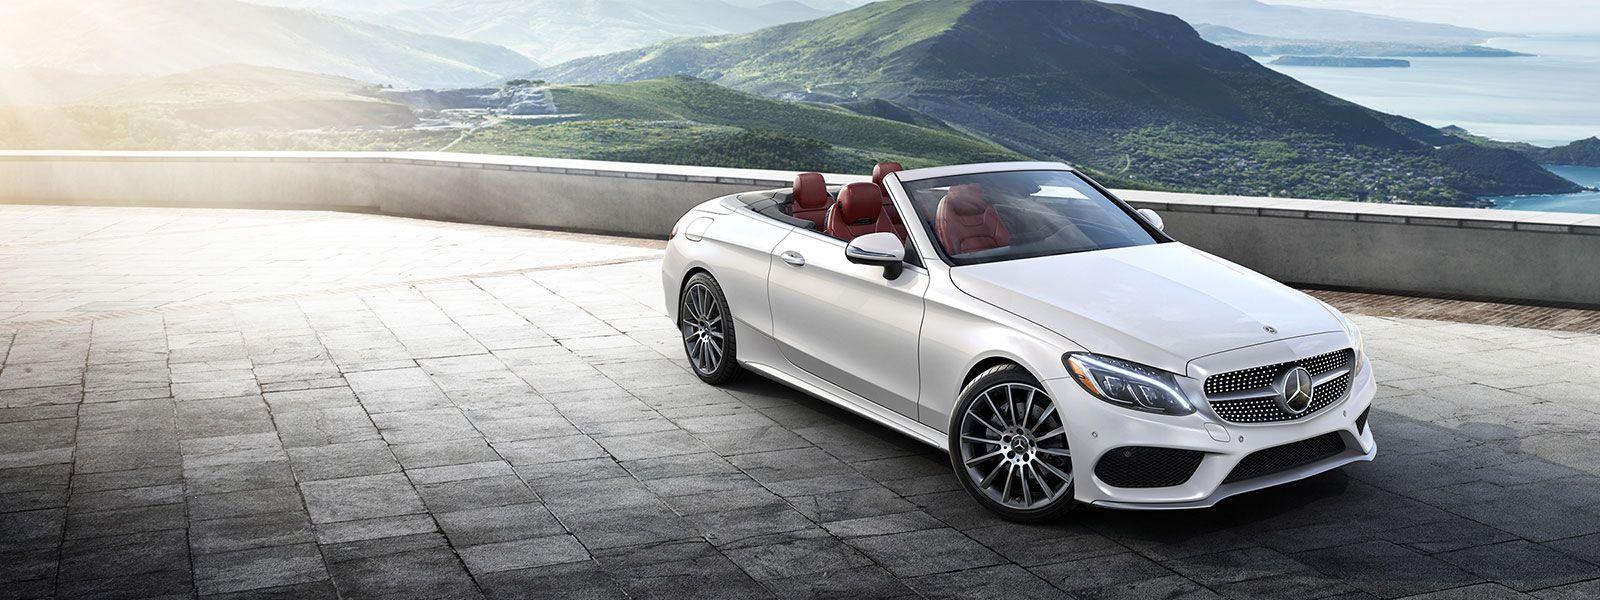 Explore The C Class Luxury Performance Cabriolet S Design